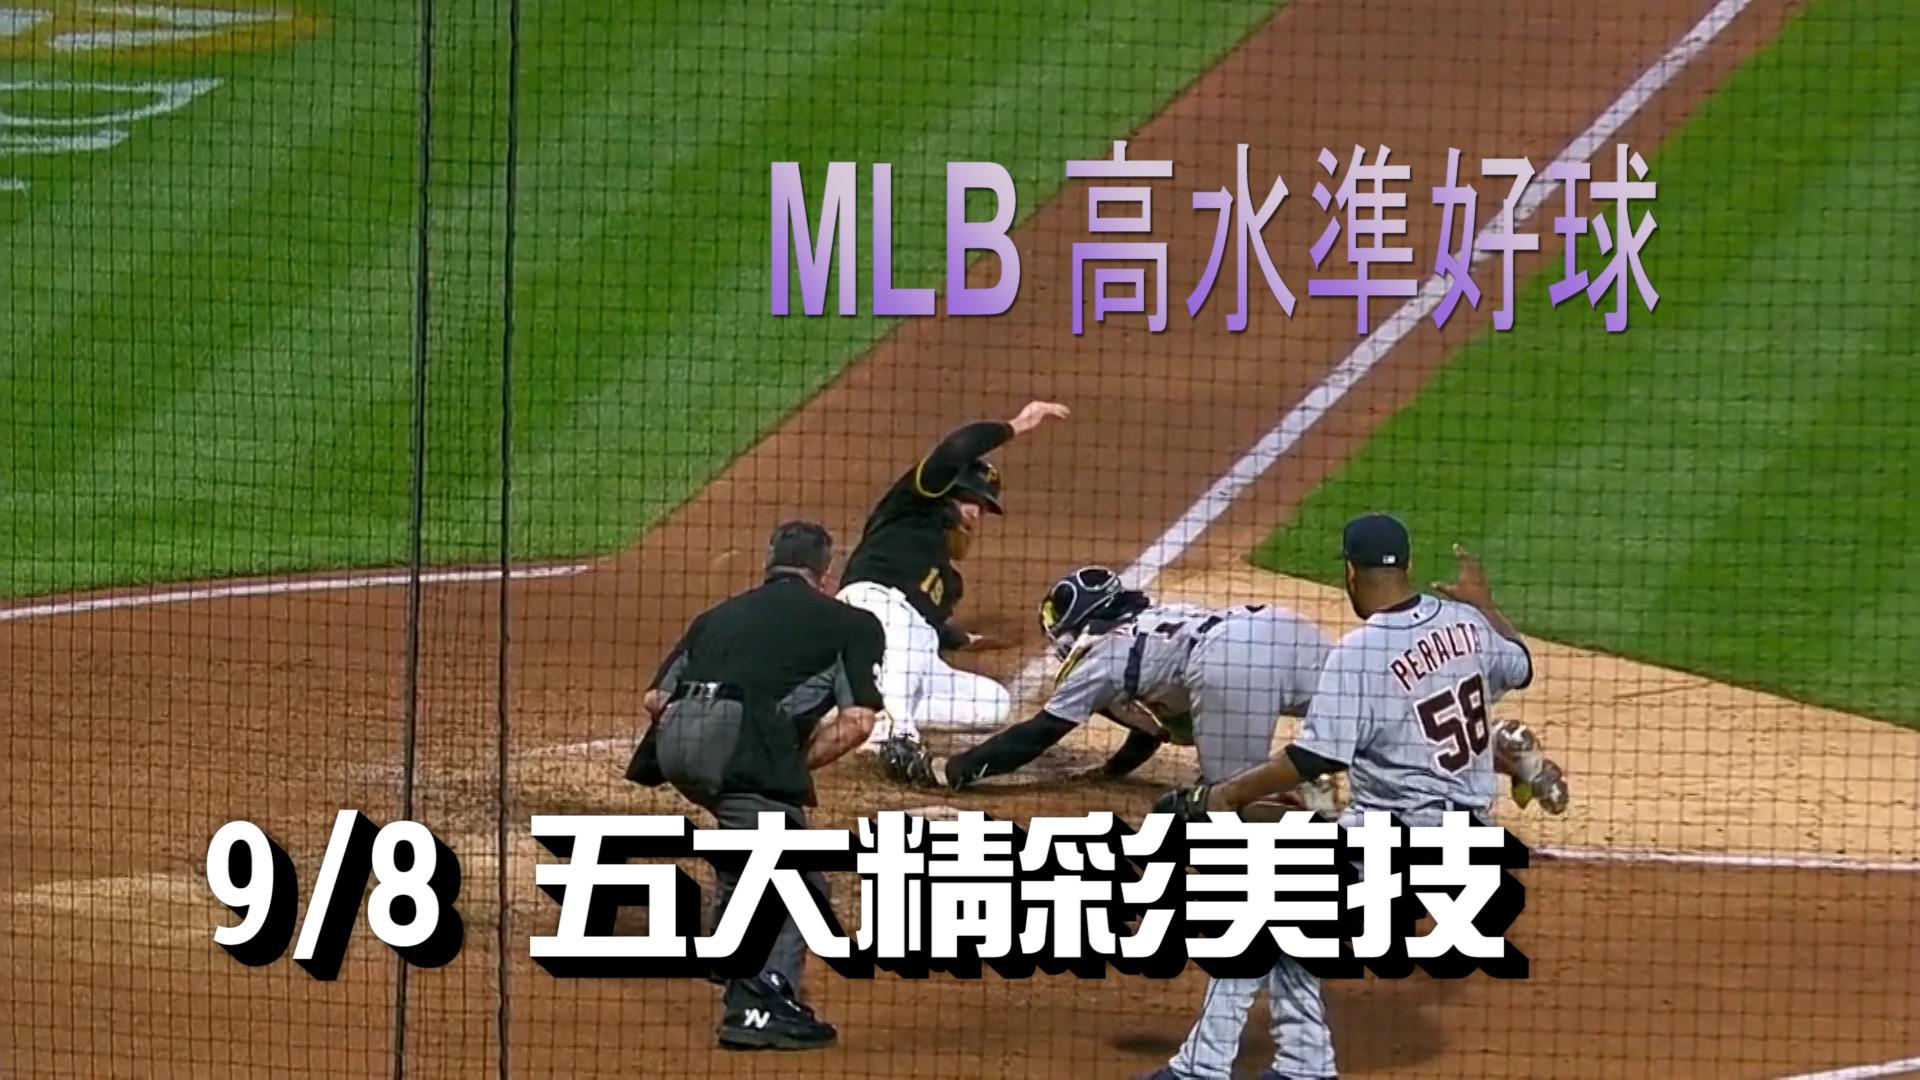 【MLB看愛爾達】MLB高水準好球 本日五大精彩美技 09/08